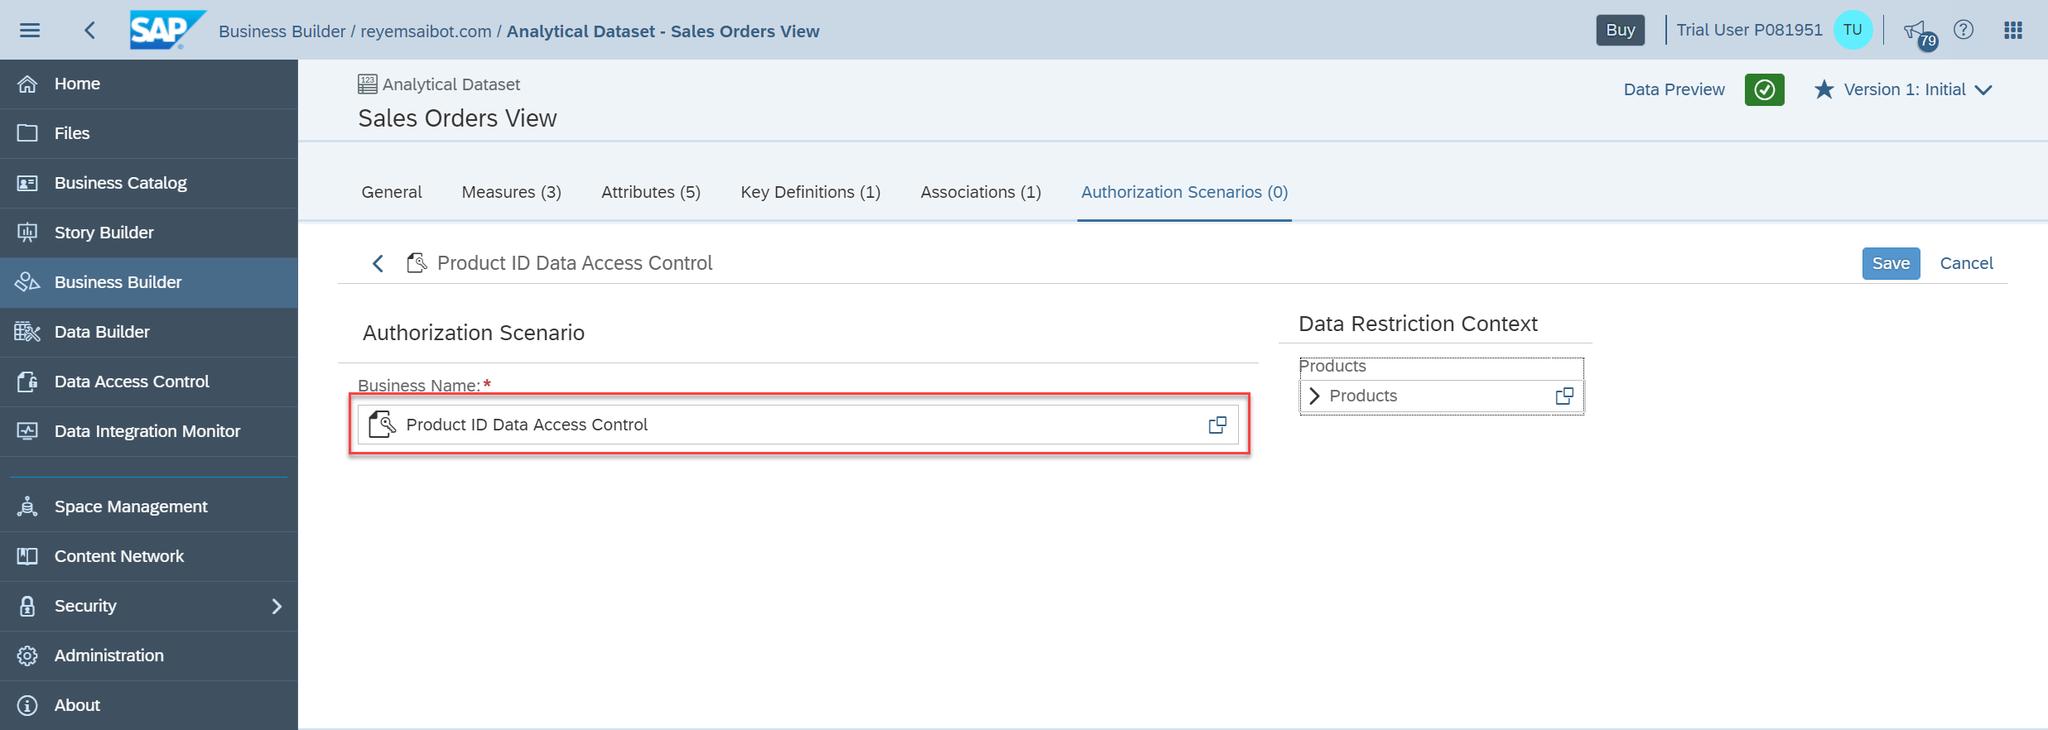 SAP Data Warehouse Cloud Define Authorization Scenario on Analytical Dataset